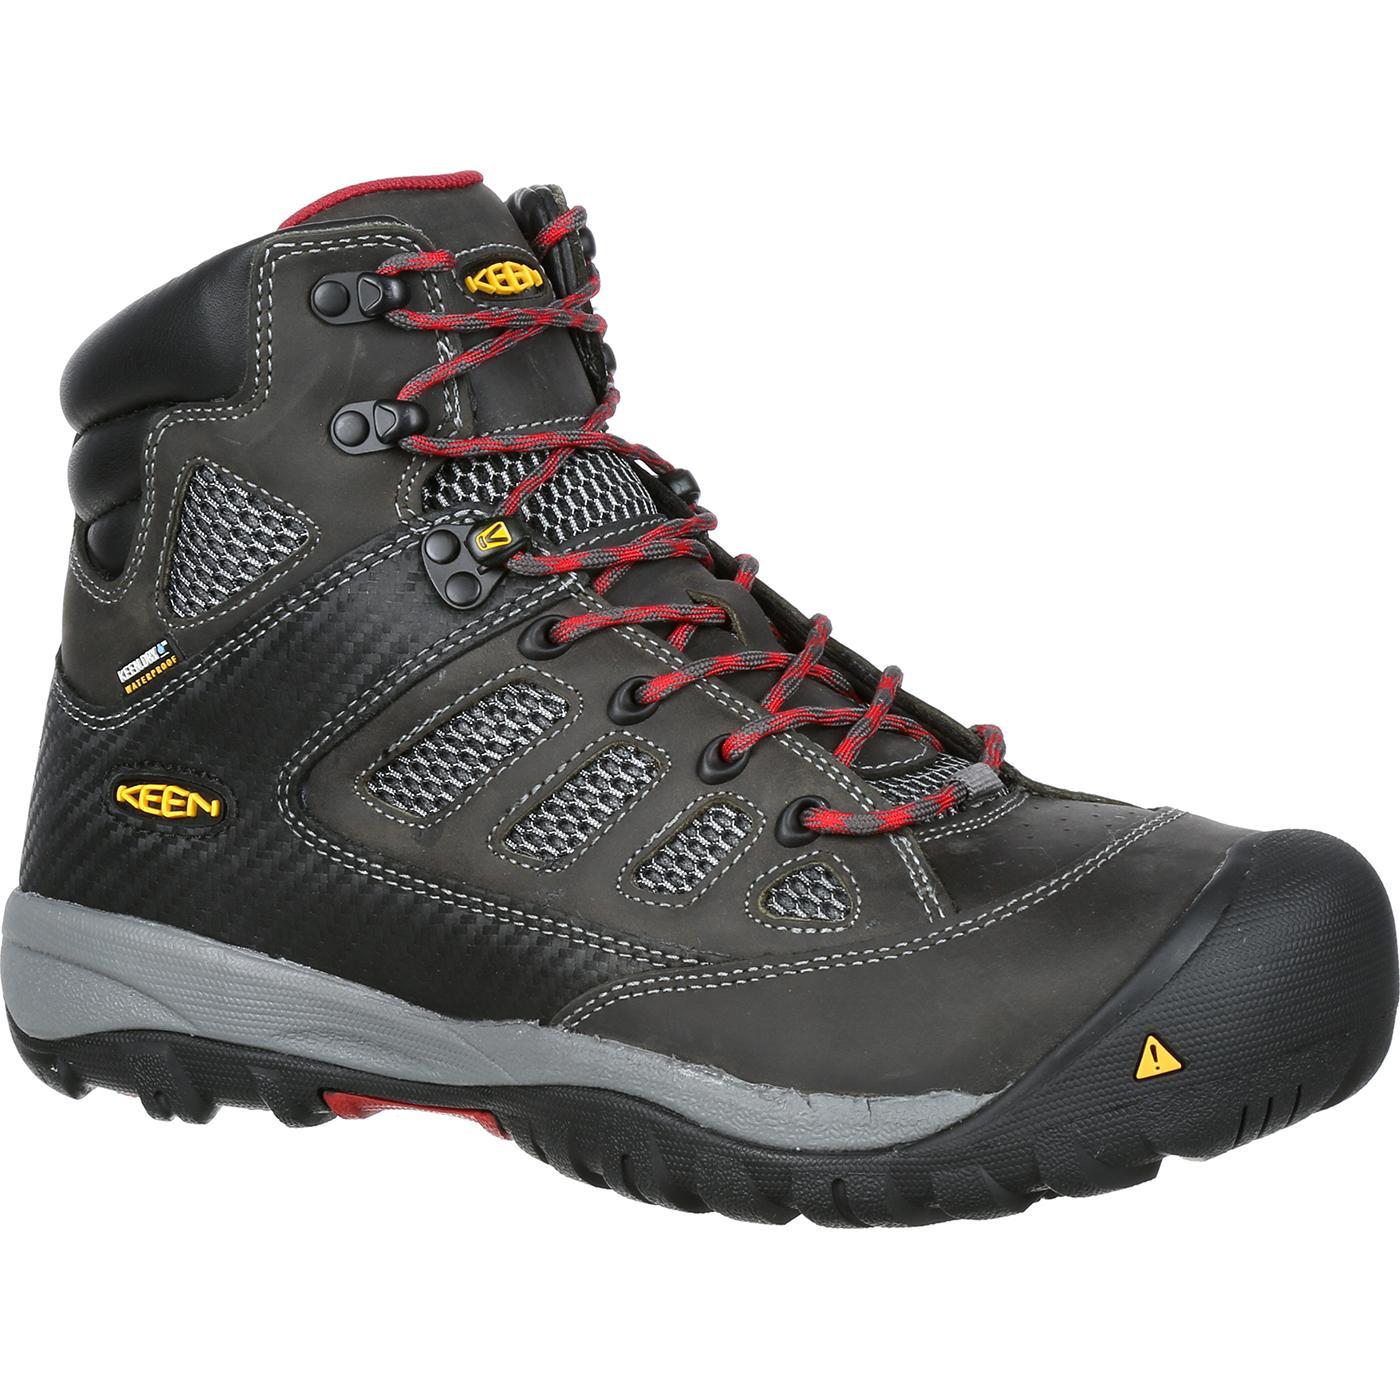 e69a98e0c75 KEEN Utility® Tucson Mid Steel Toe Work Shoe